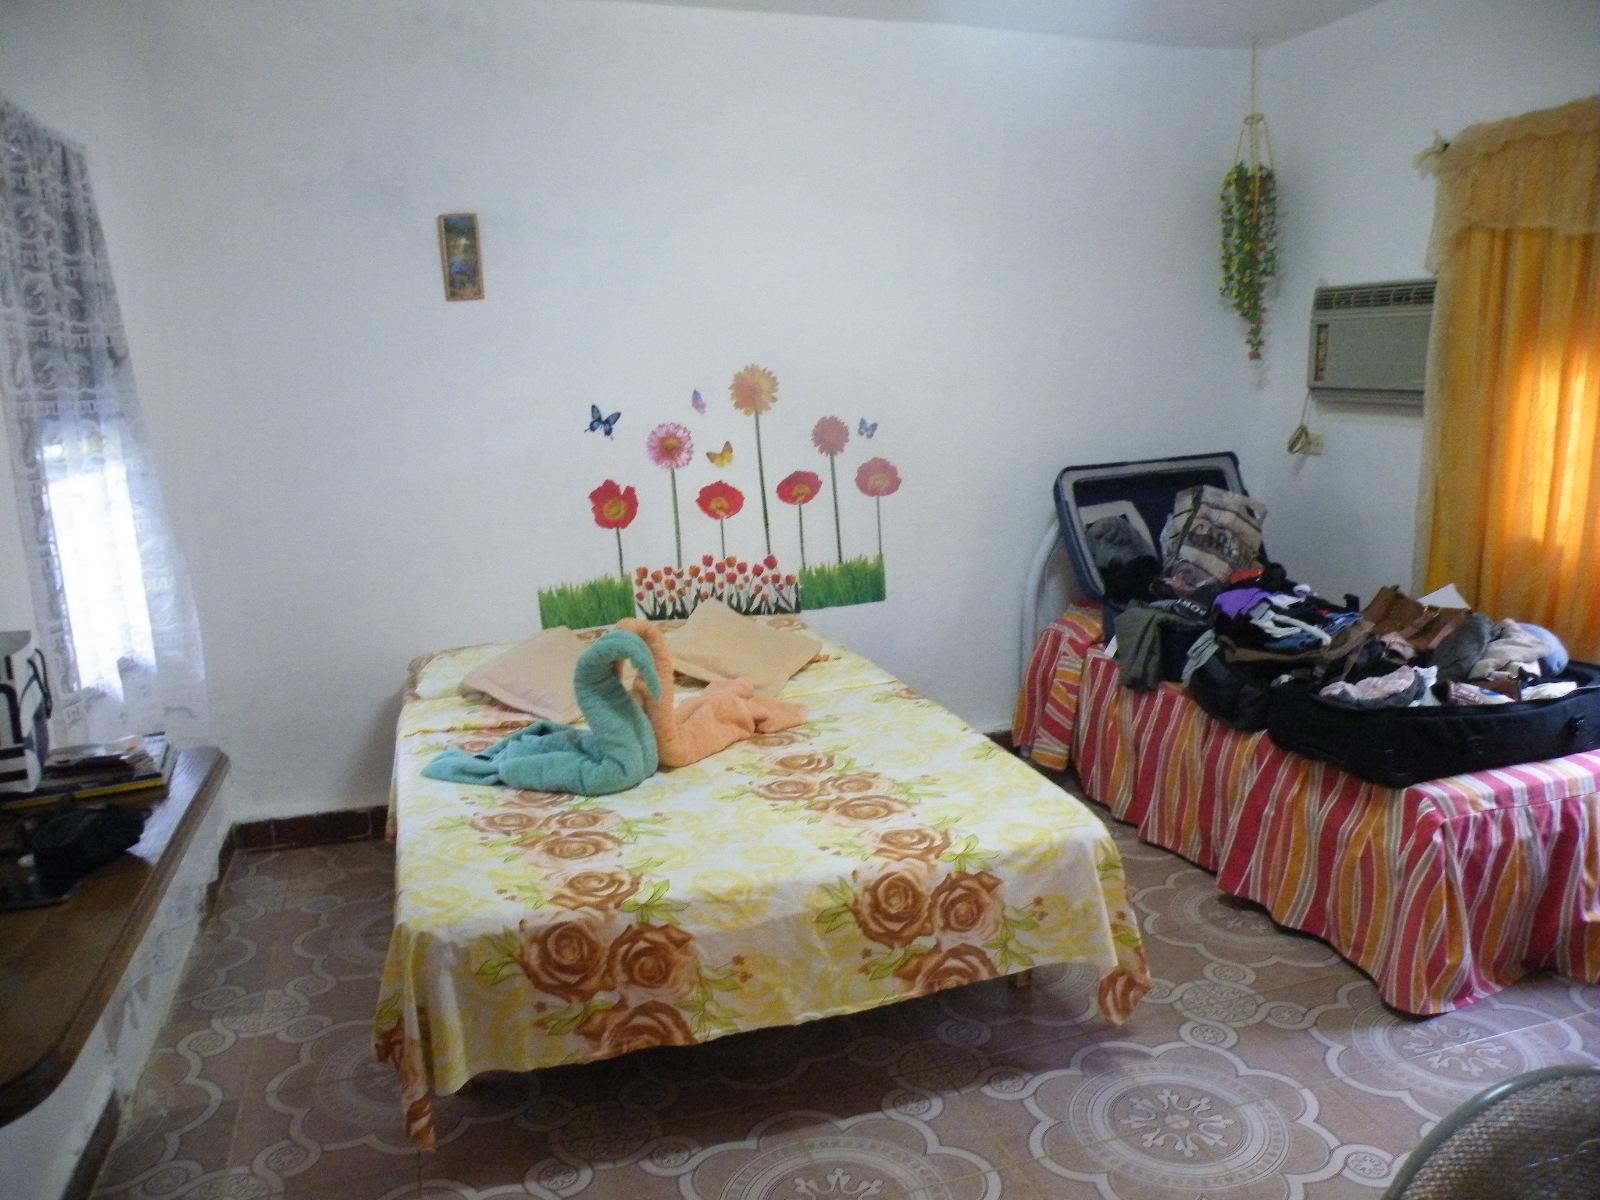 VAR021 – Room 1 Quadruple room with private bathroom